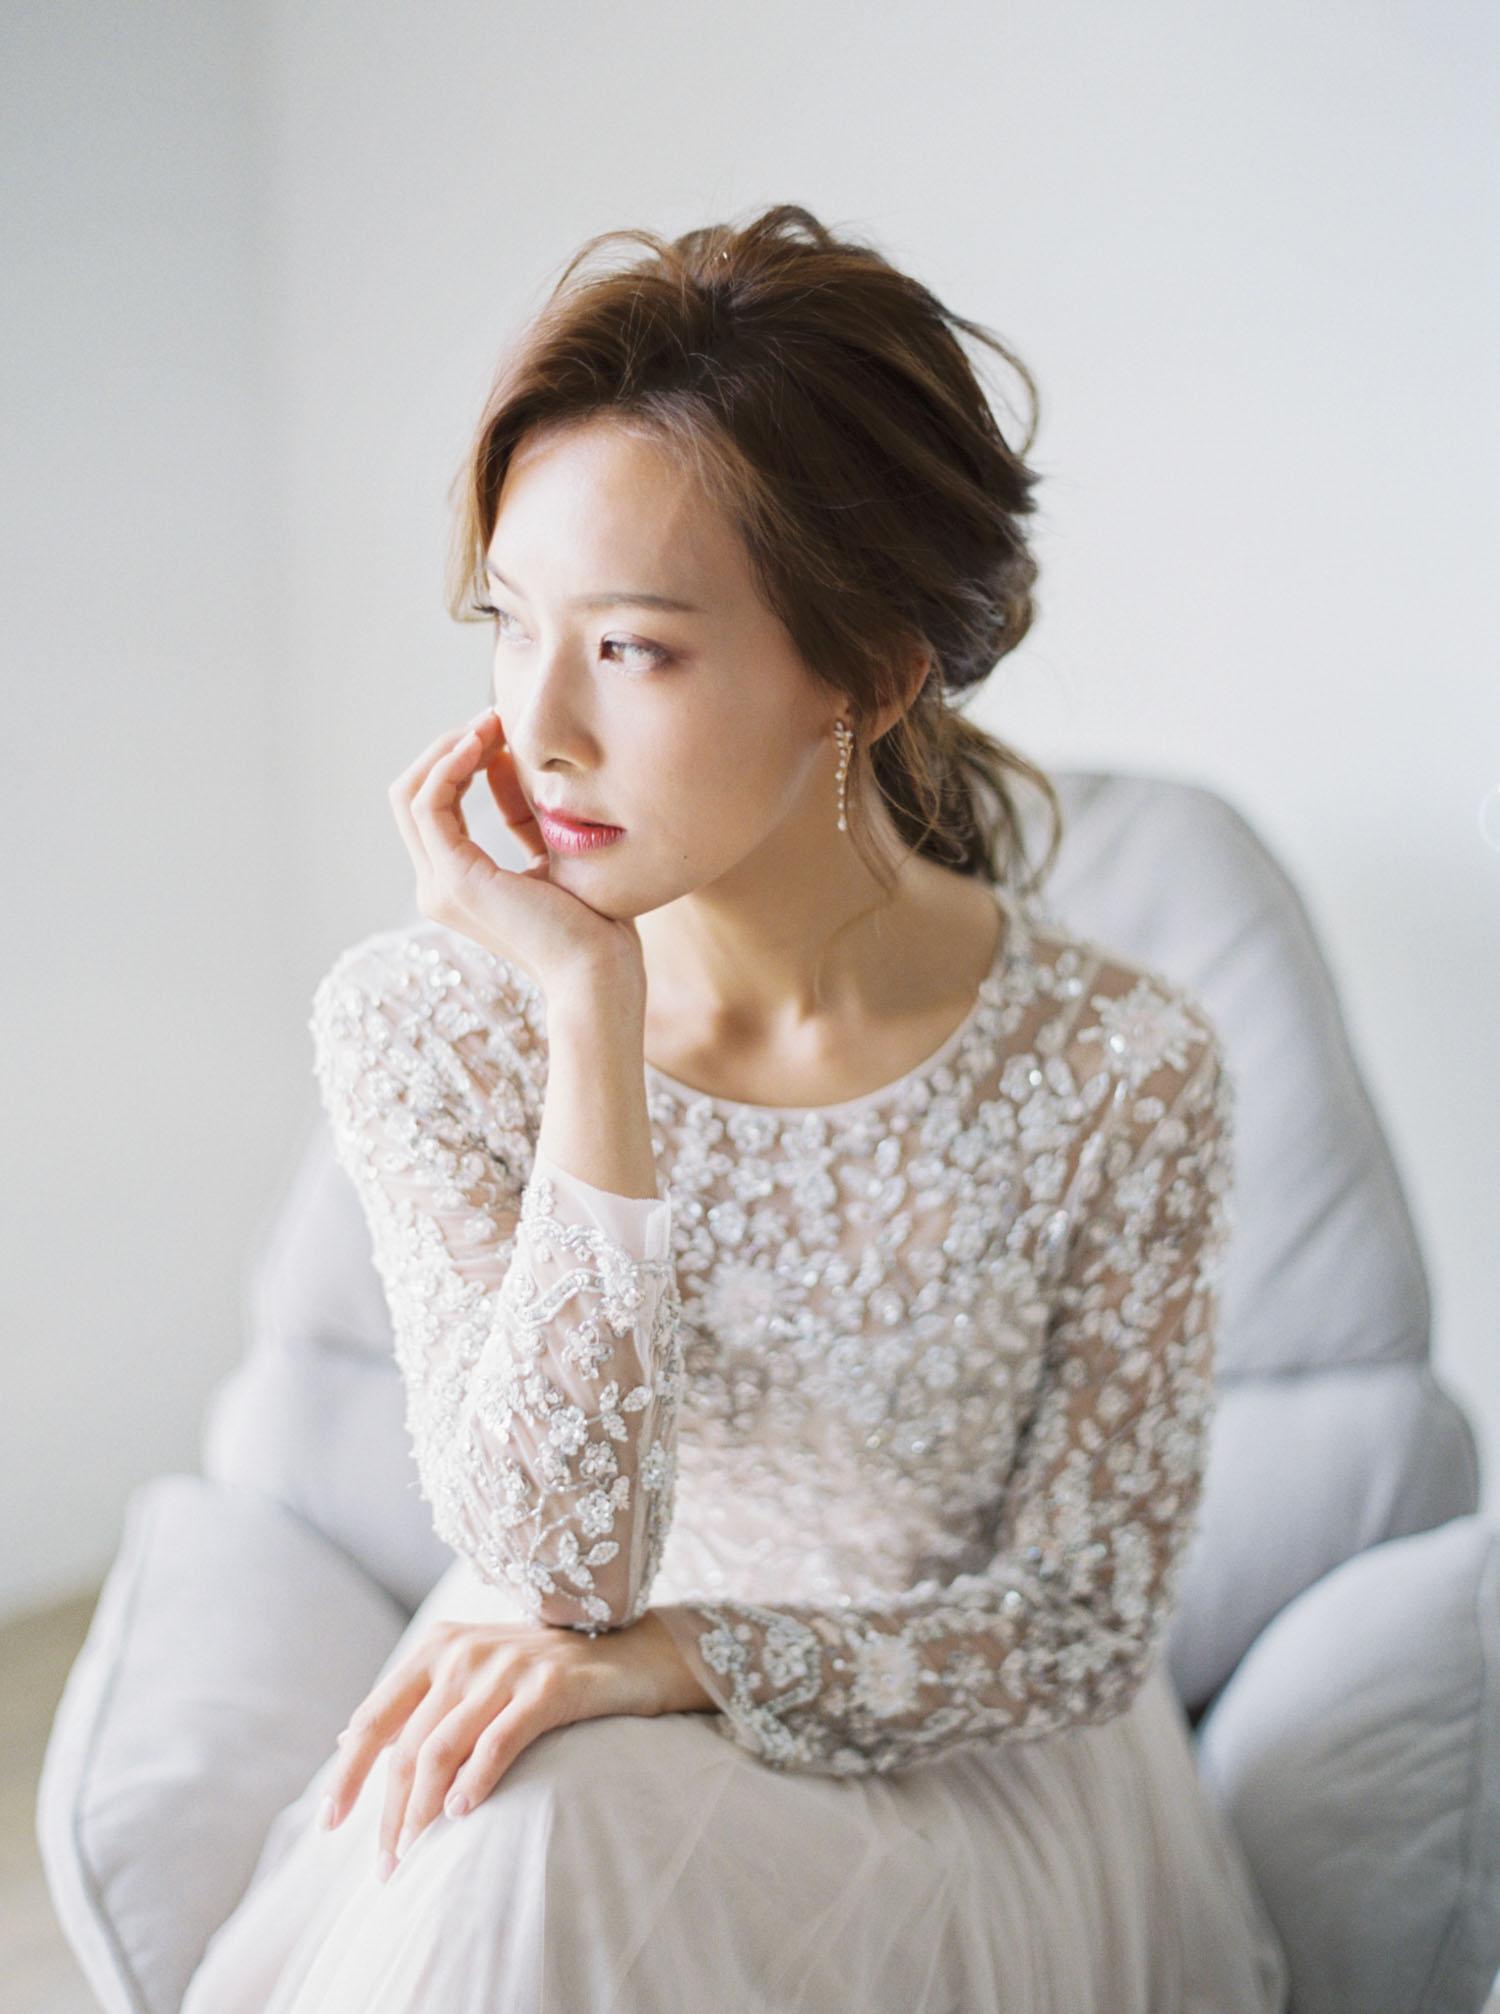 Christy 陳瑋薇 婚紗 唯諾婚紗